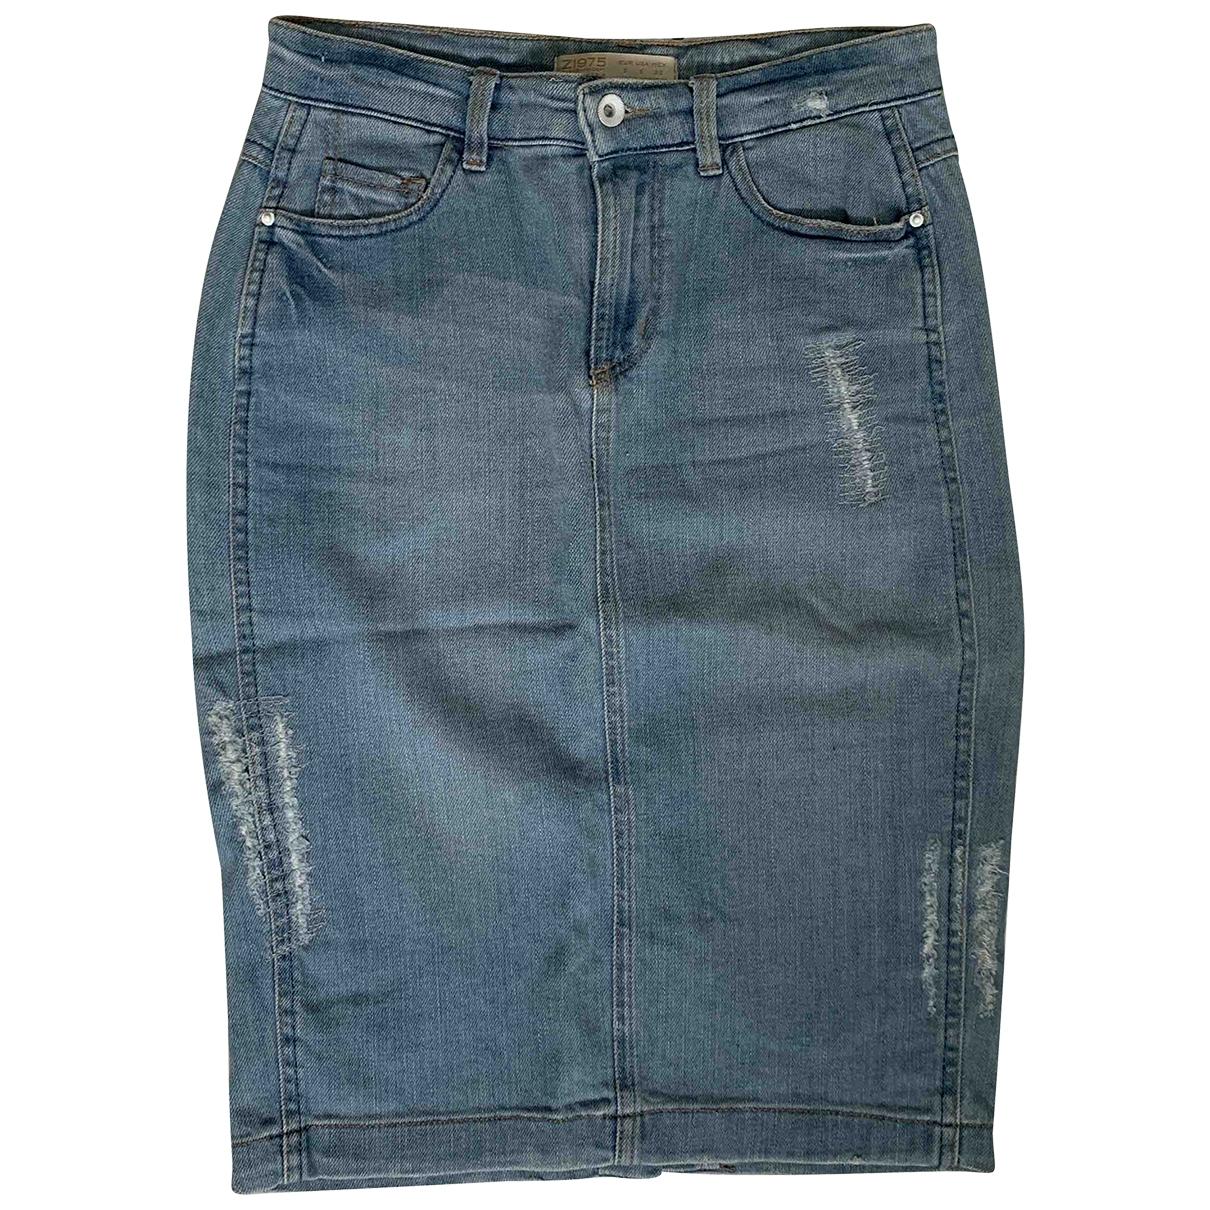 Zara \N Rocke in  Blau Denim - Jeans